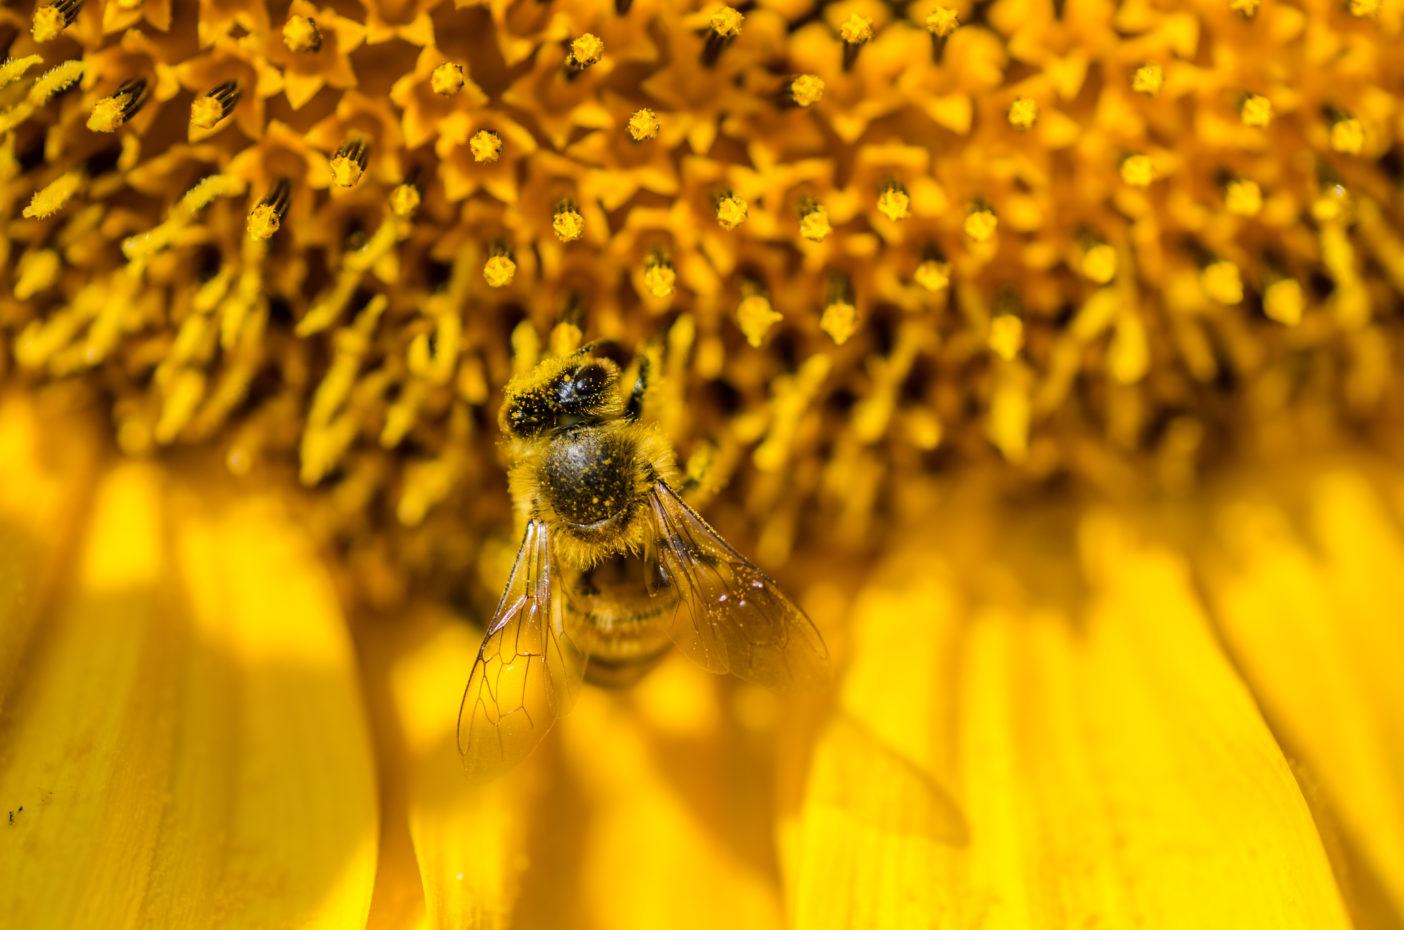 Bienengift - Melittin - Apitoxin - Botoxalternative